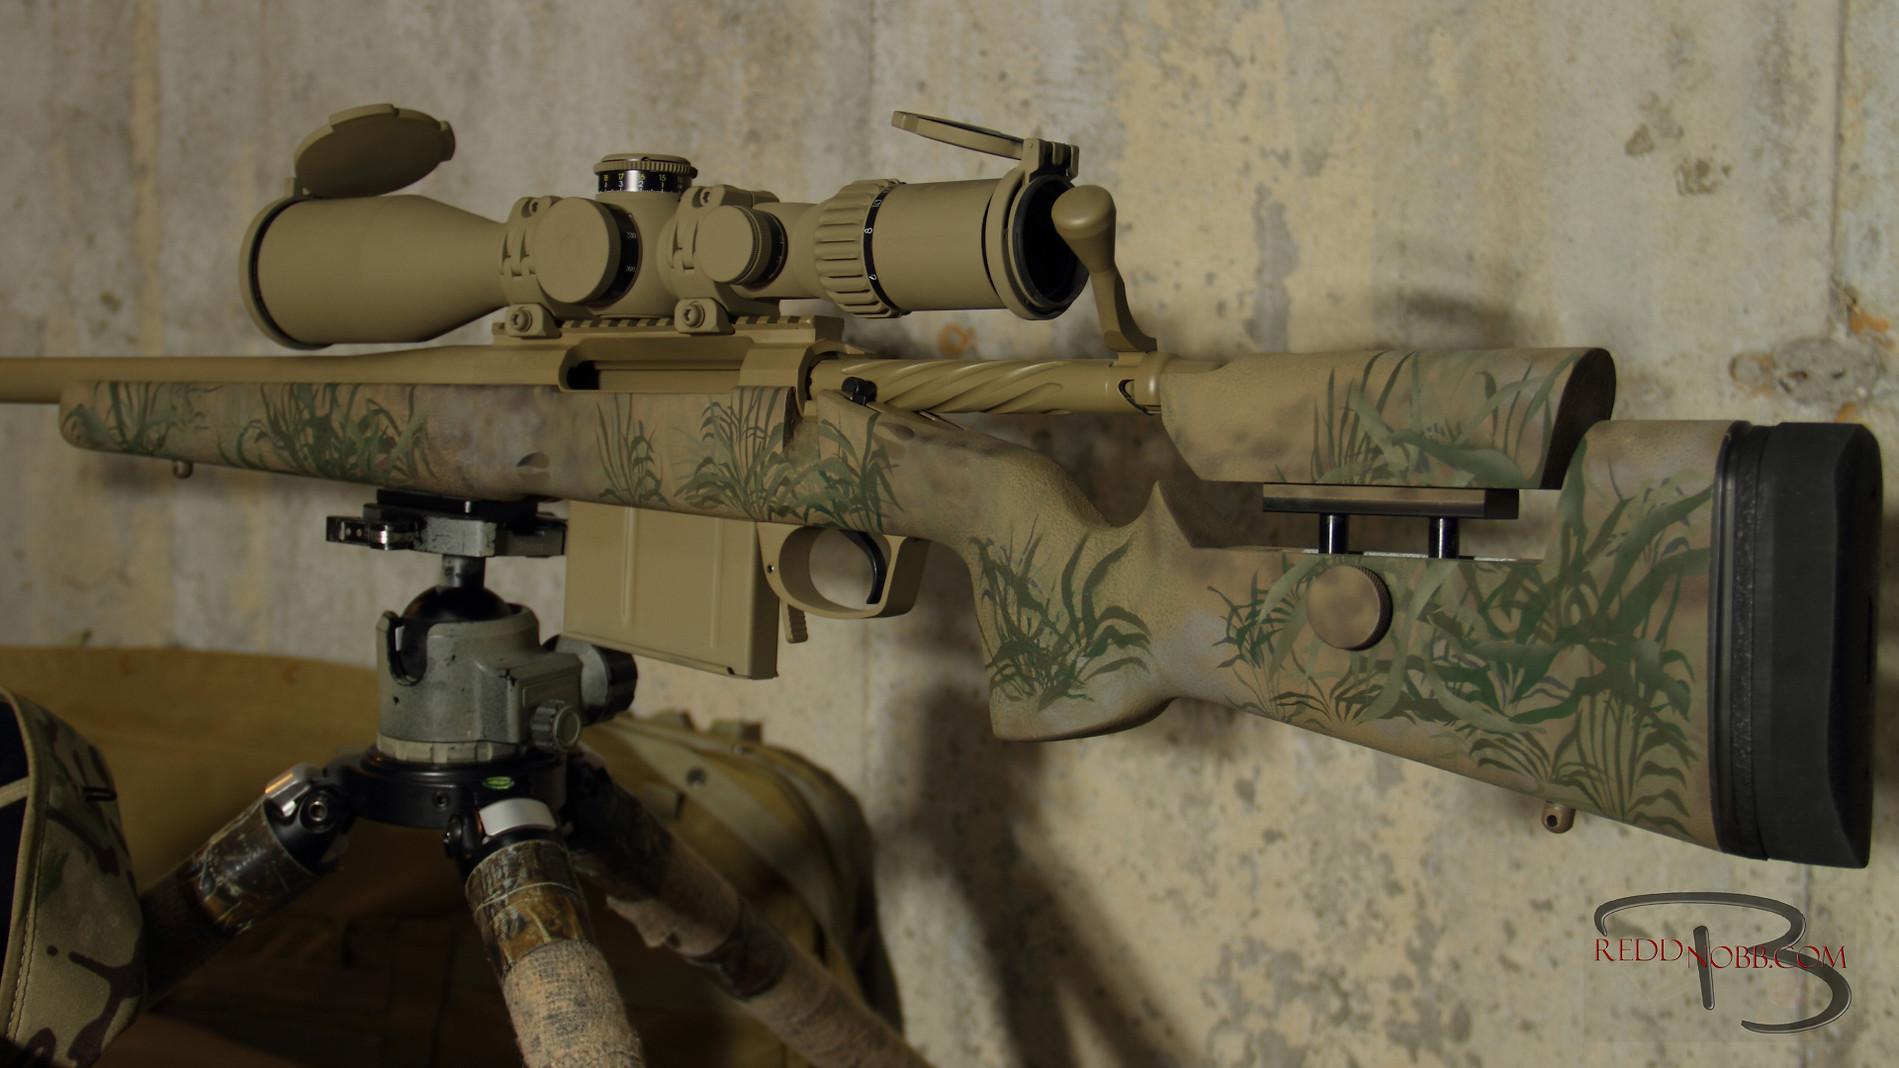 Une 338 Lapua Mag long range hunter 2de64c_a25429aebbec49d6bd2b3e4c9e2a86fc~mv2